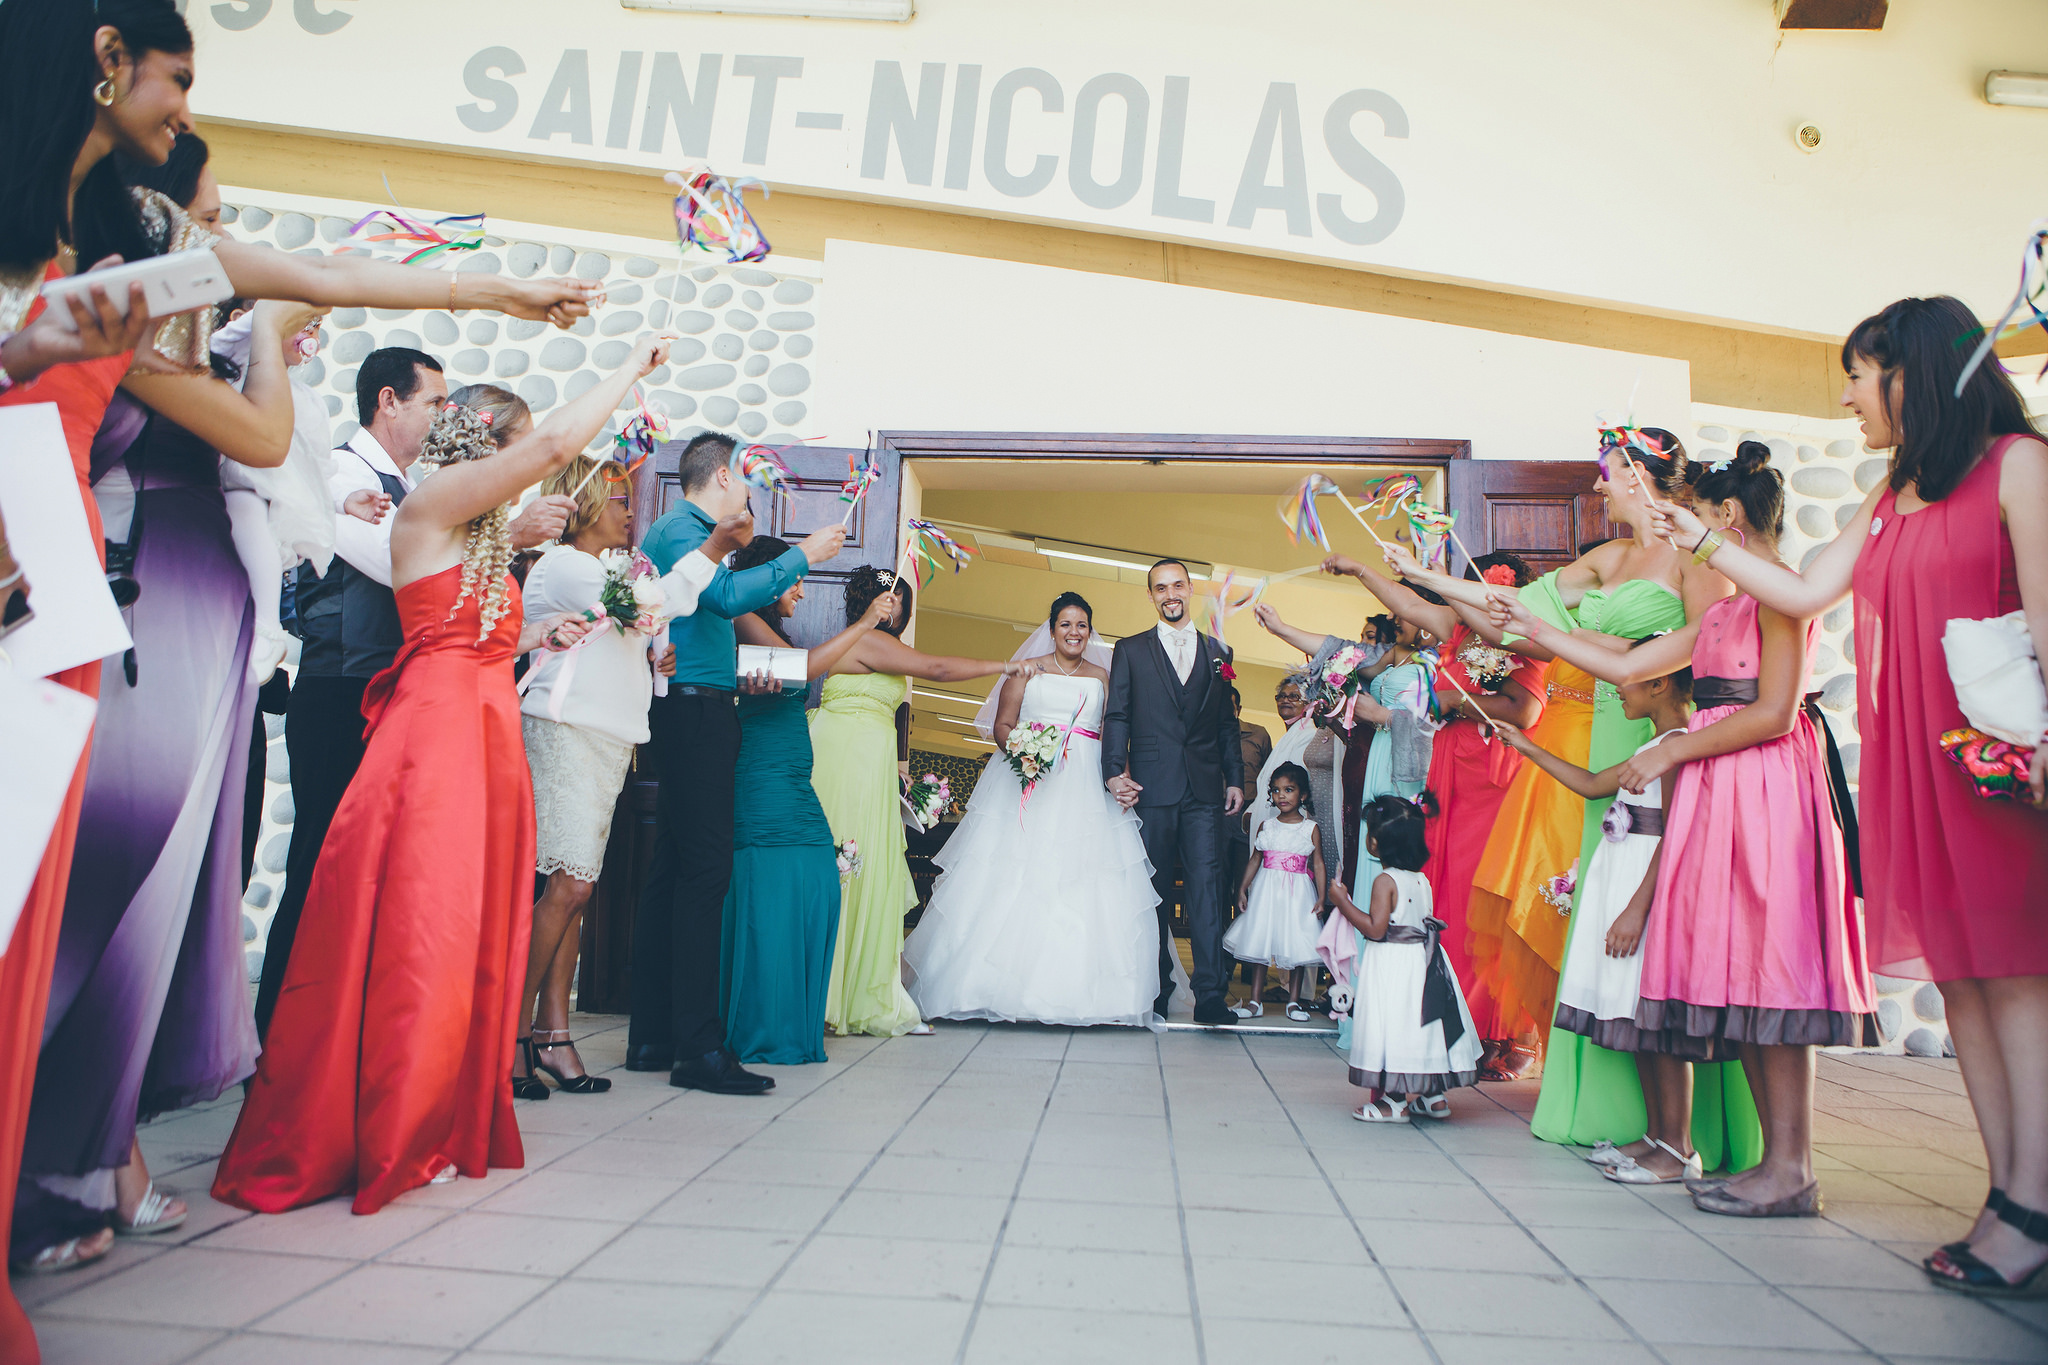 Le mariage gourmand et multicolore de Mimi